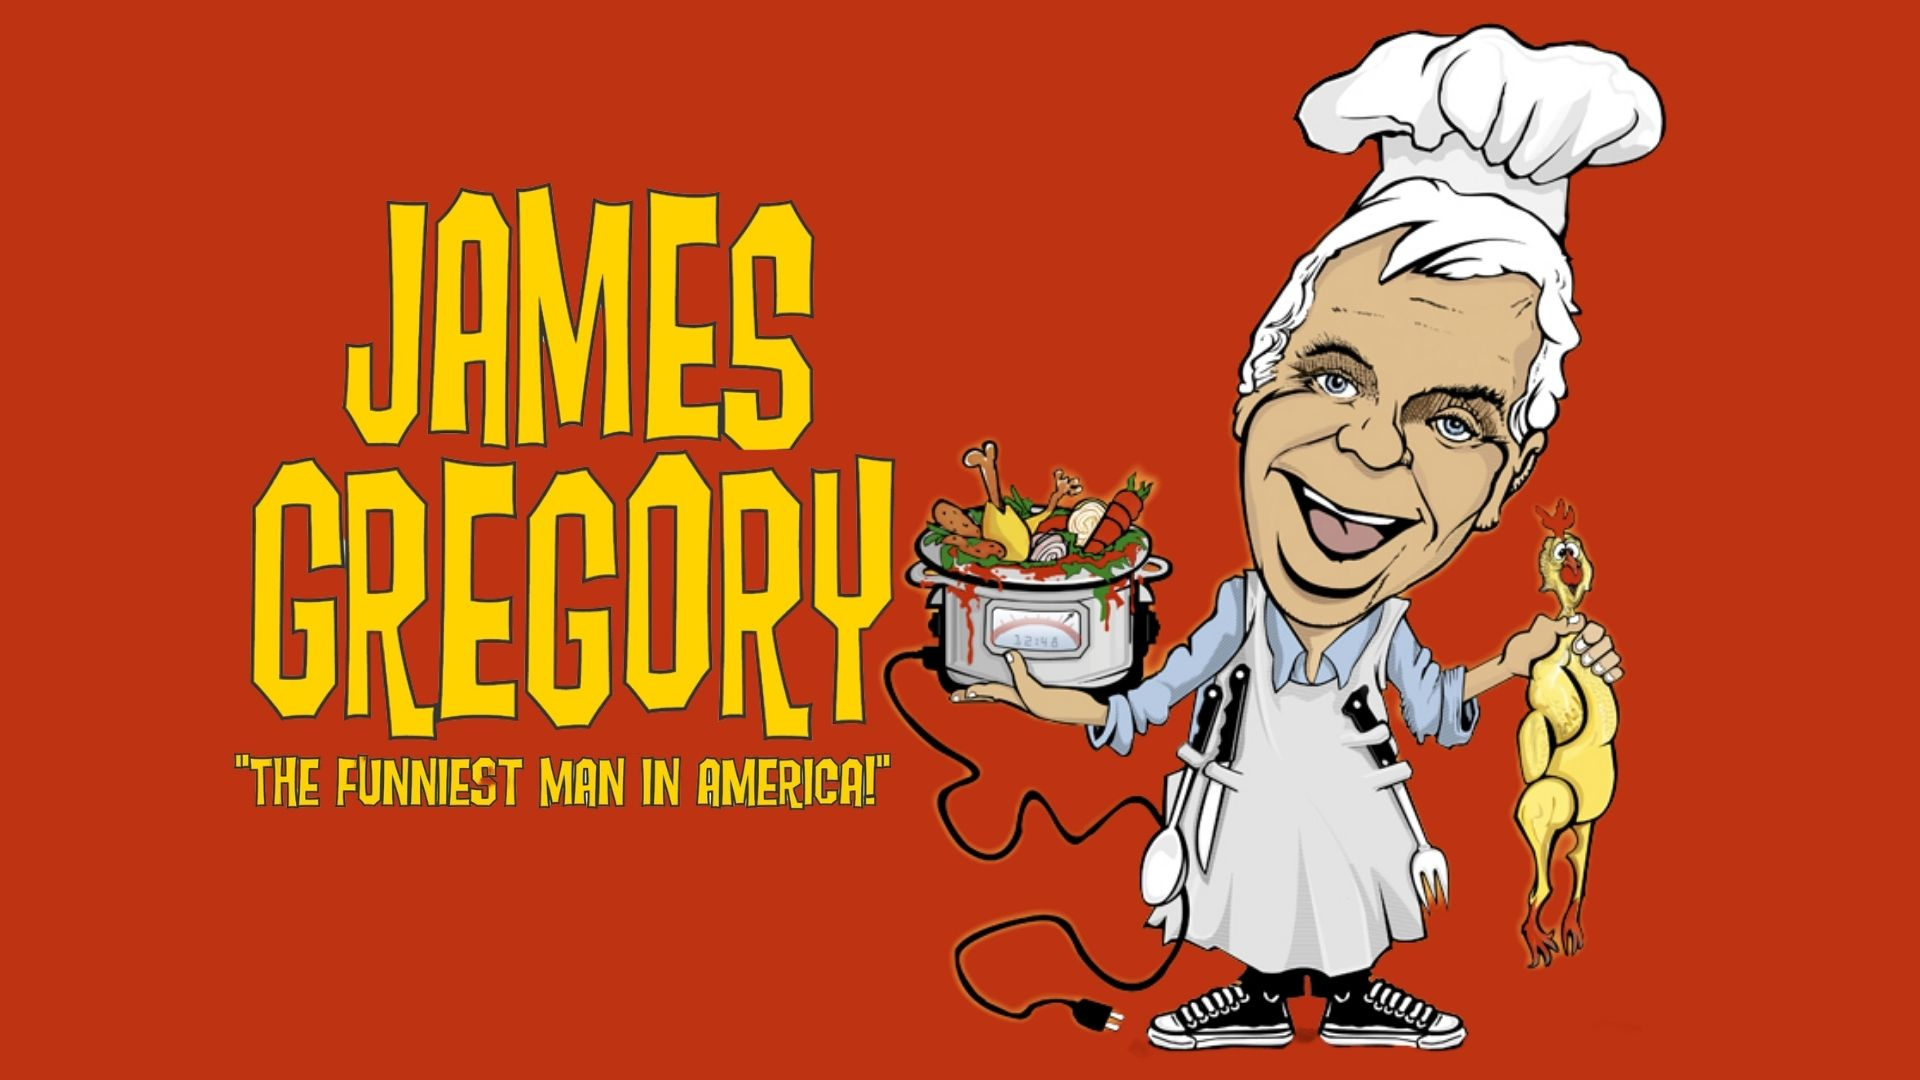 JAMES GREGORY (WEB)